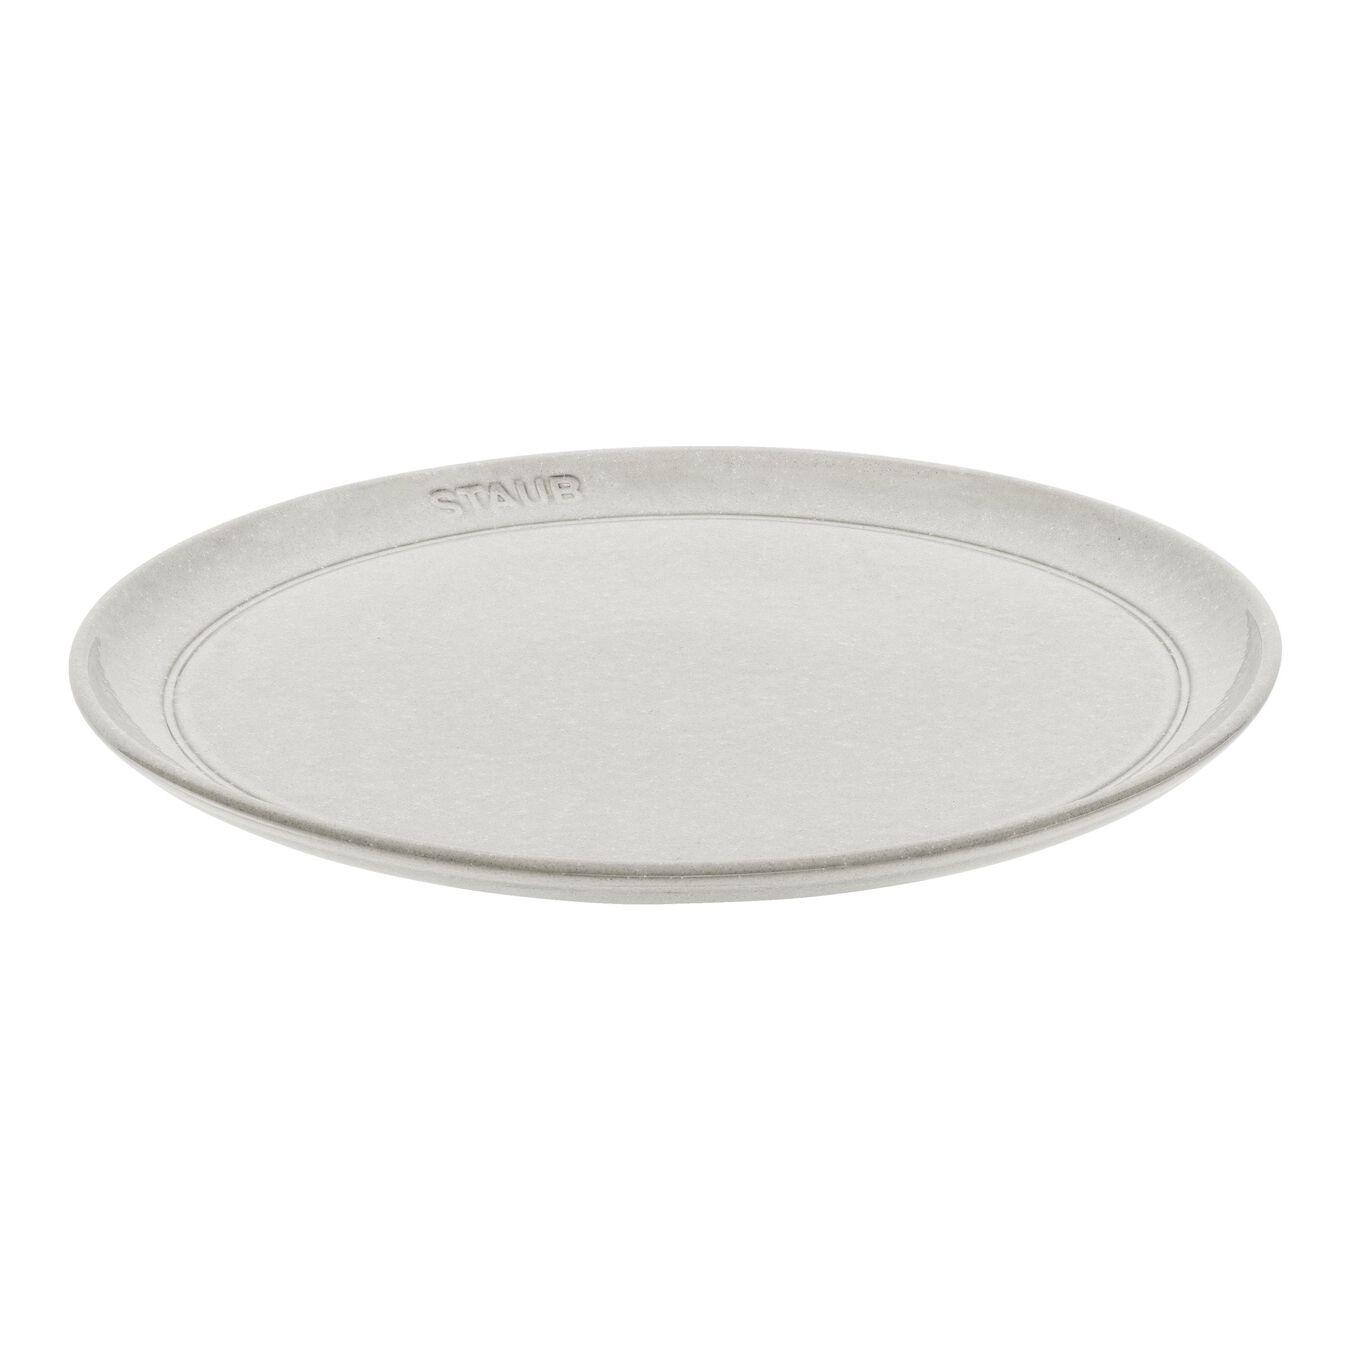 26 cm Ceramic round Plate flat, white truffle,,large 1